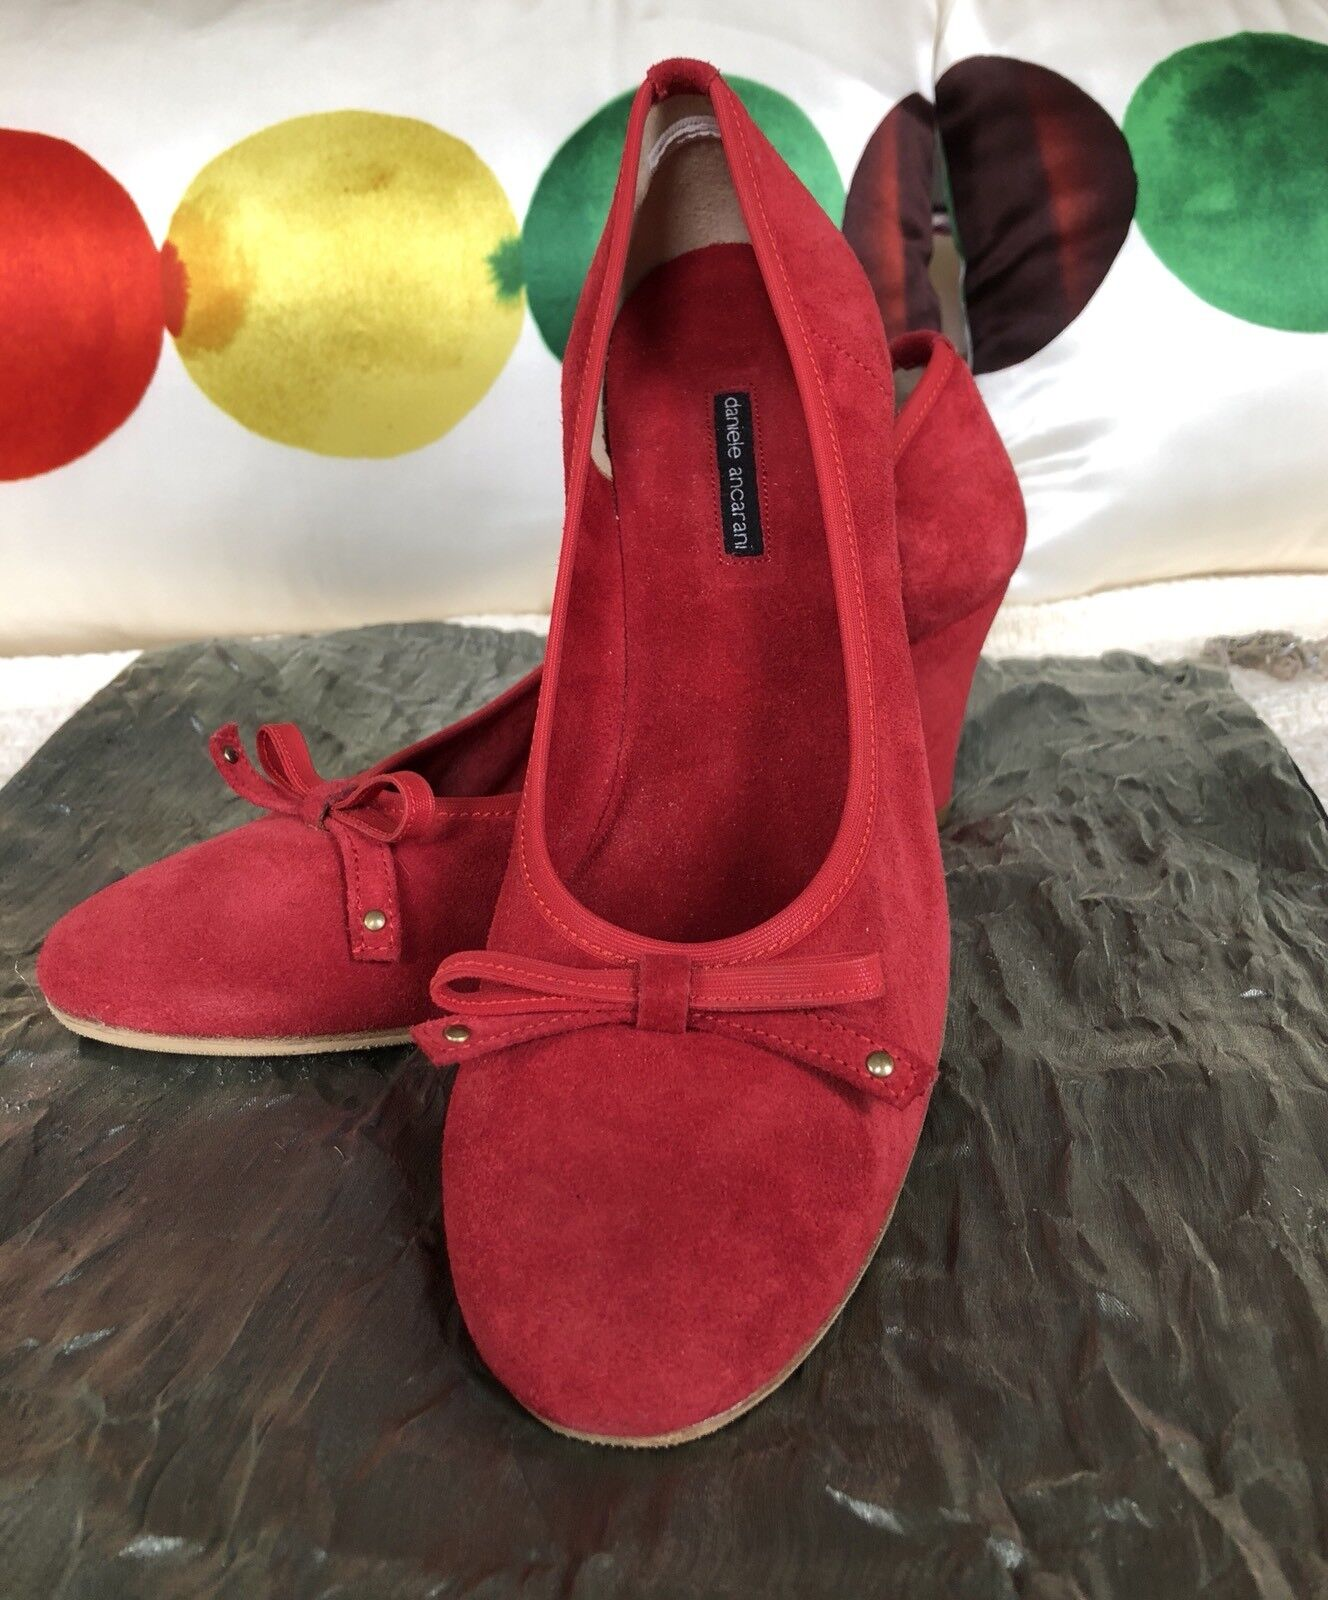 DANIELE ANCARANI ITALY BOW SUEDE rot schuhe Größe Größe Größe 7 f67f55